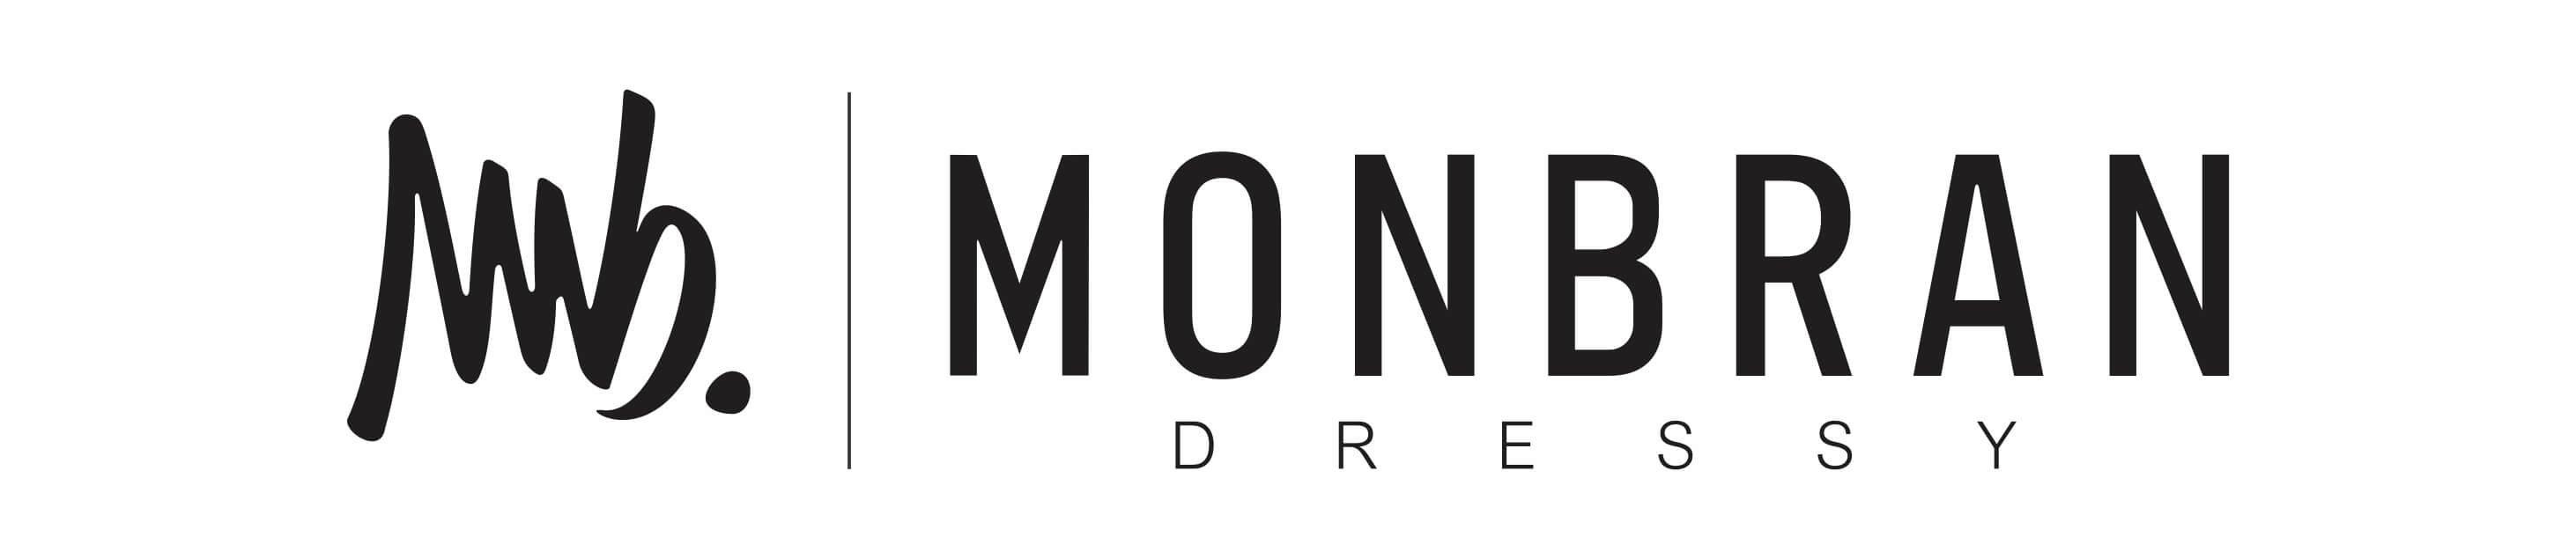 Monbran